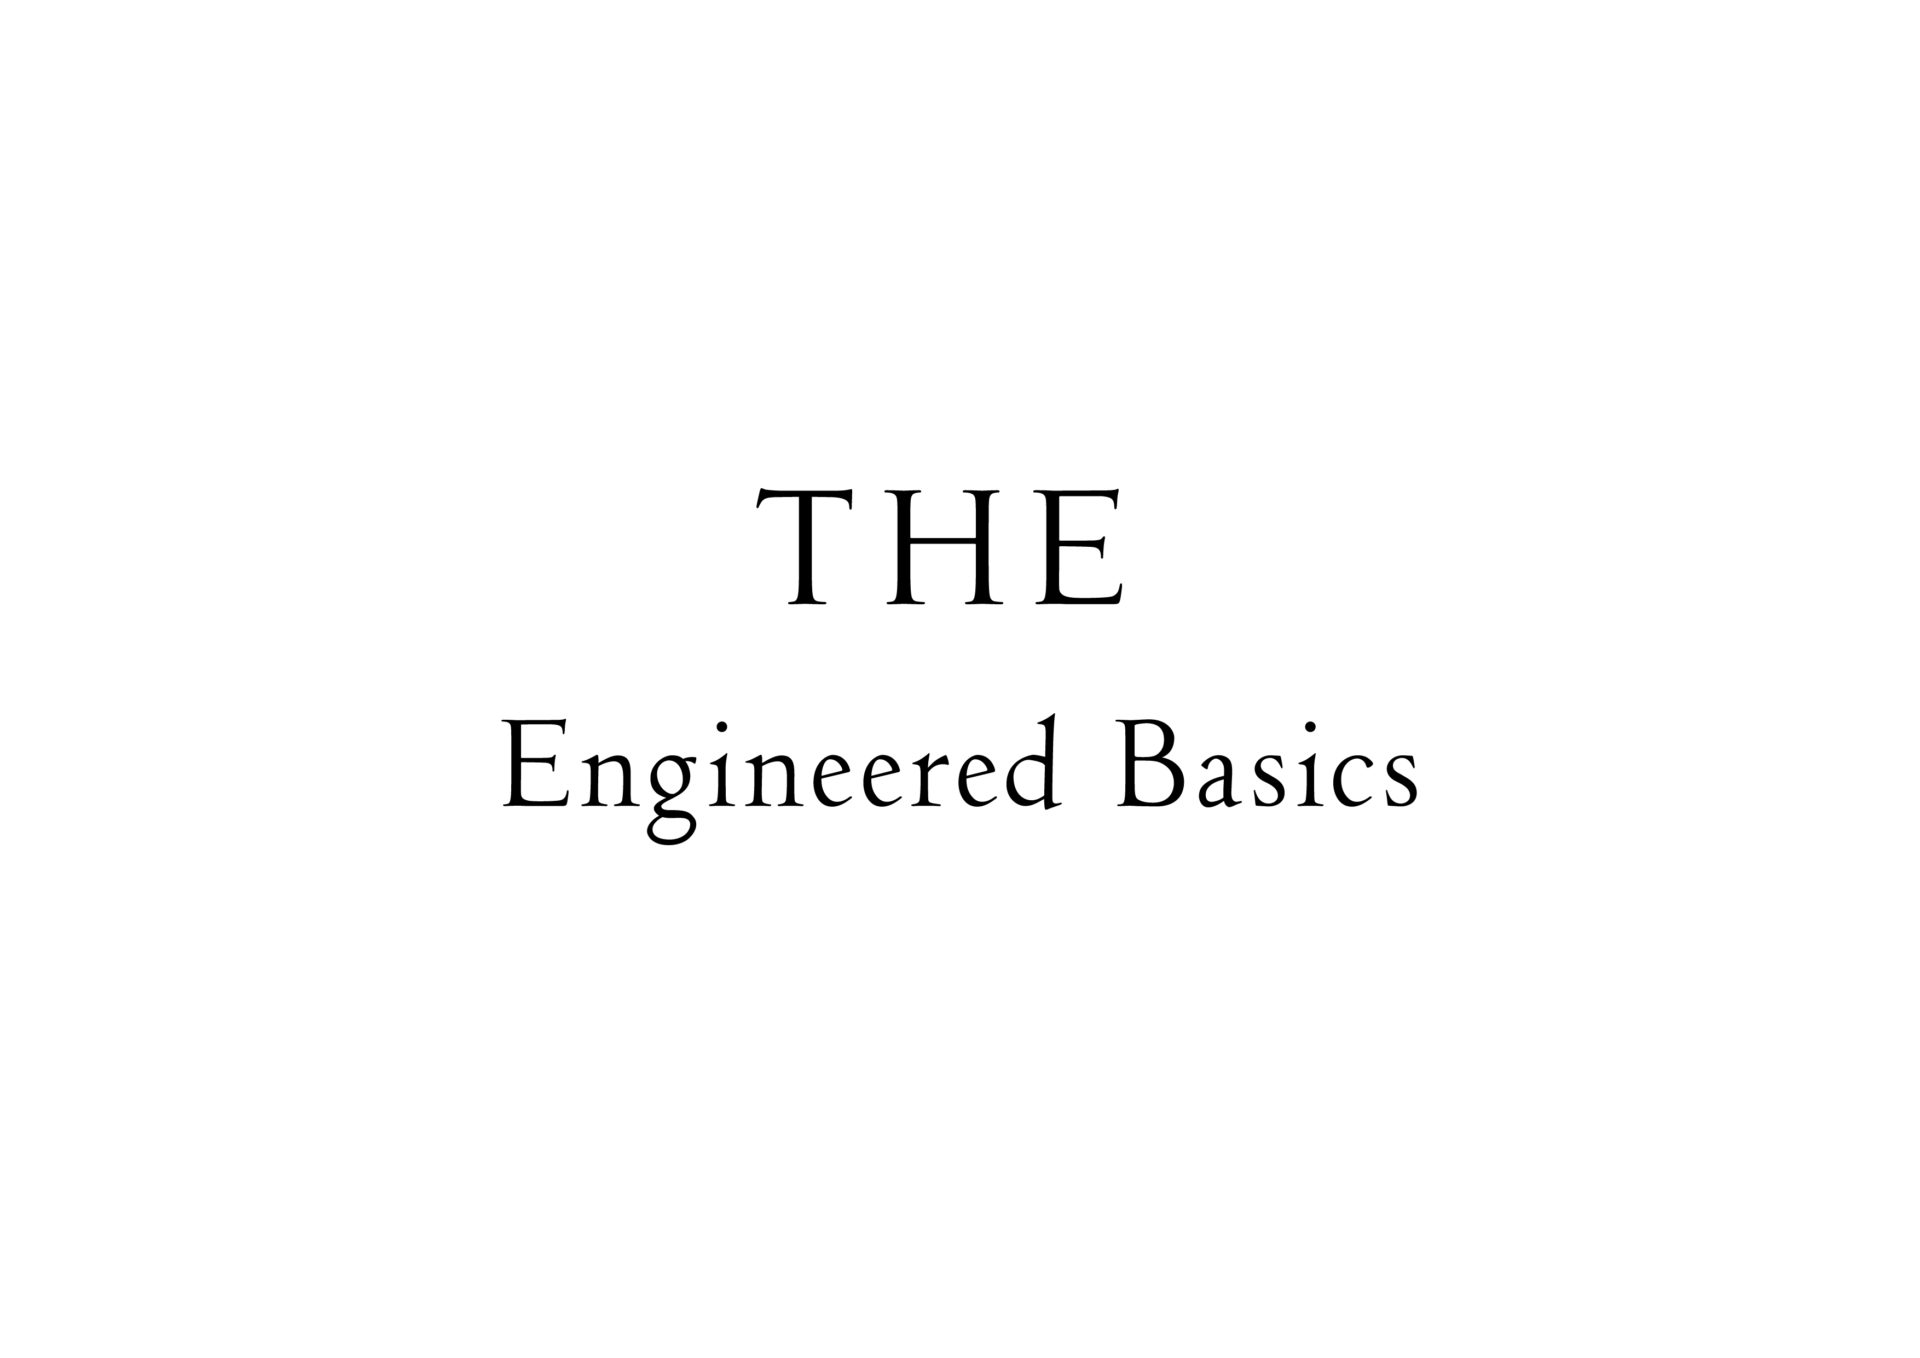 THE Engineered Basics